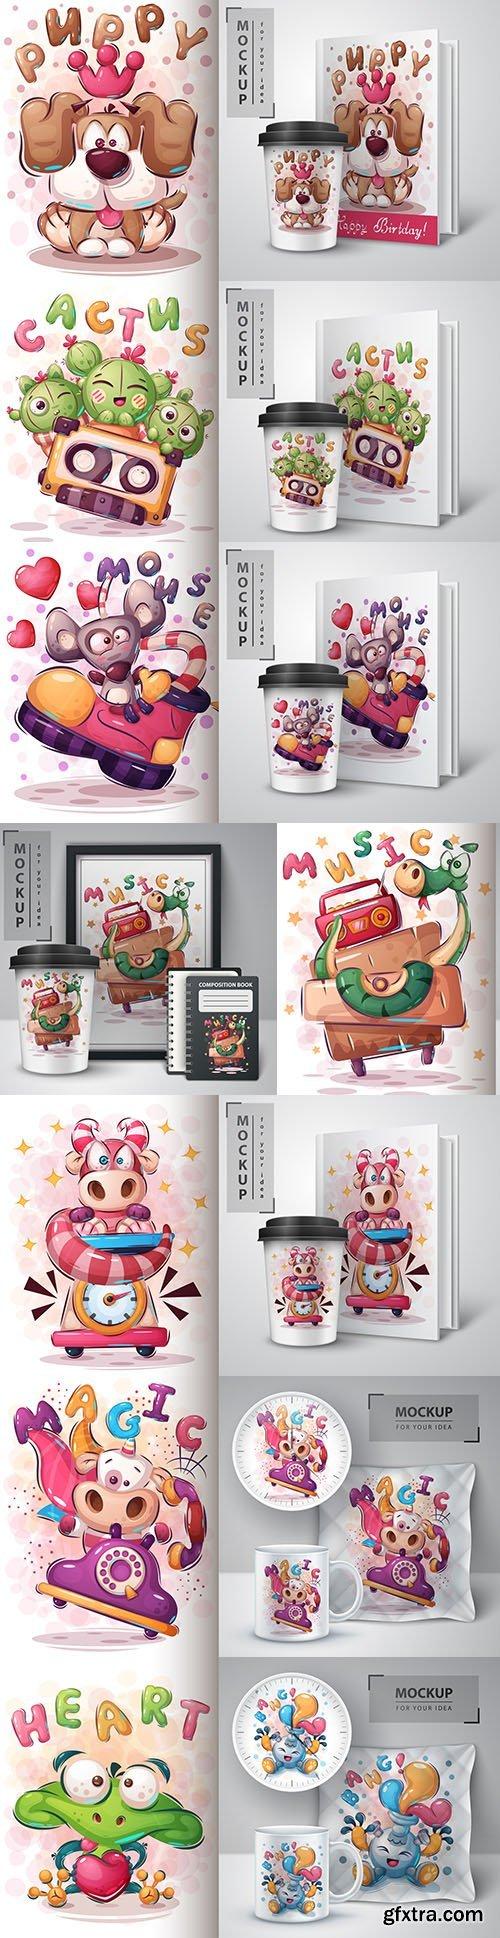 Funny illustration and merchandising mockup print t-shirt 8